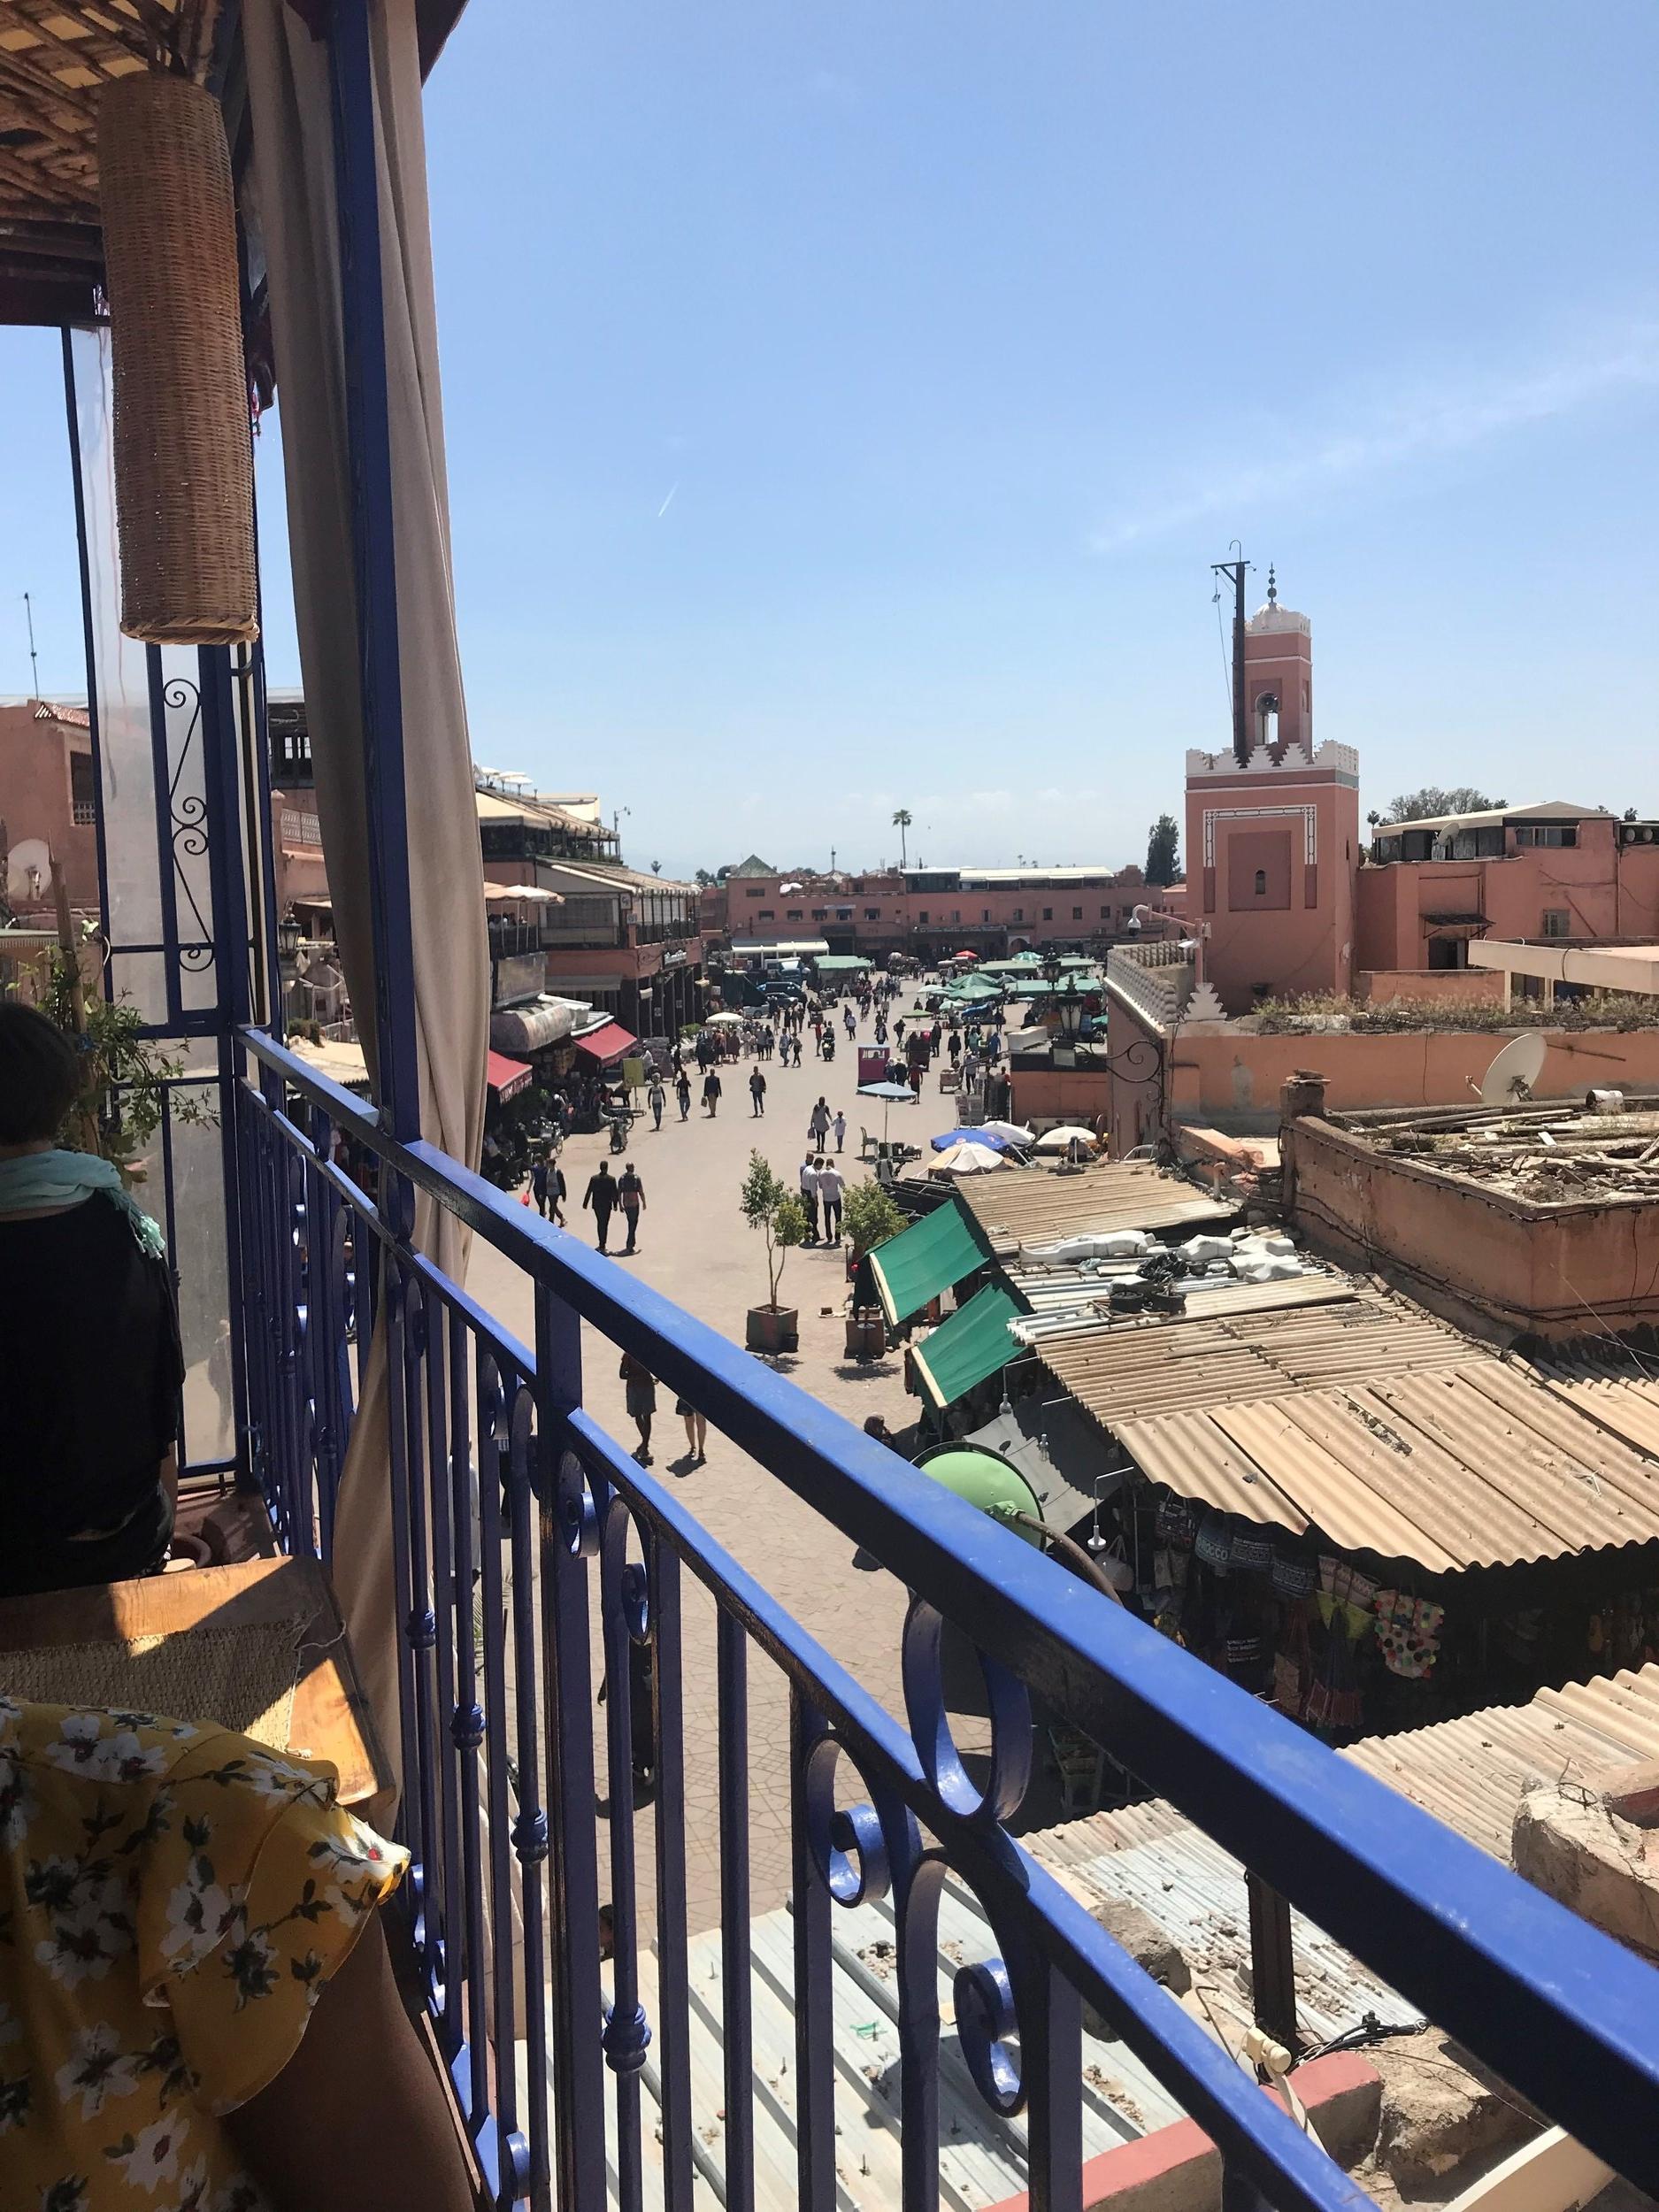 The medina in Marrakech. Photo credit: Rehman, 2018